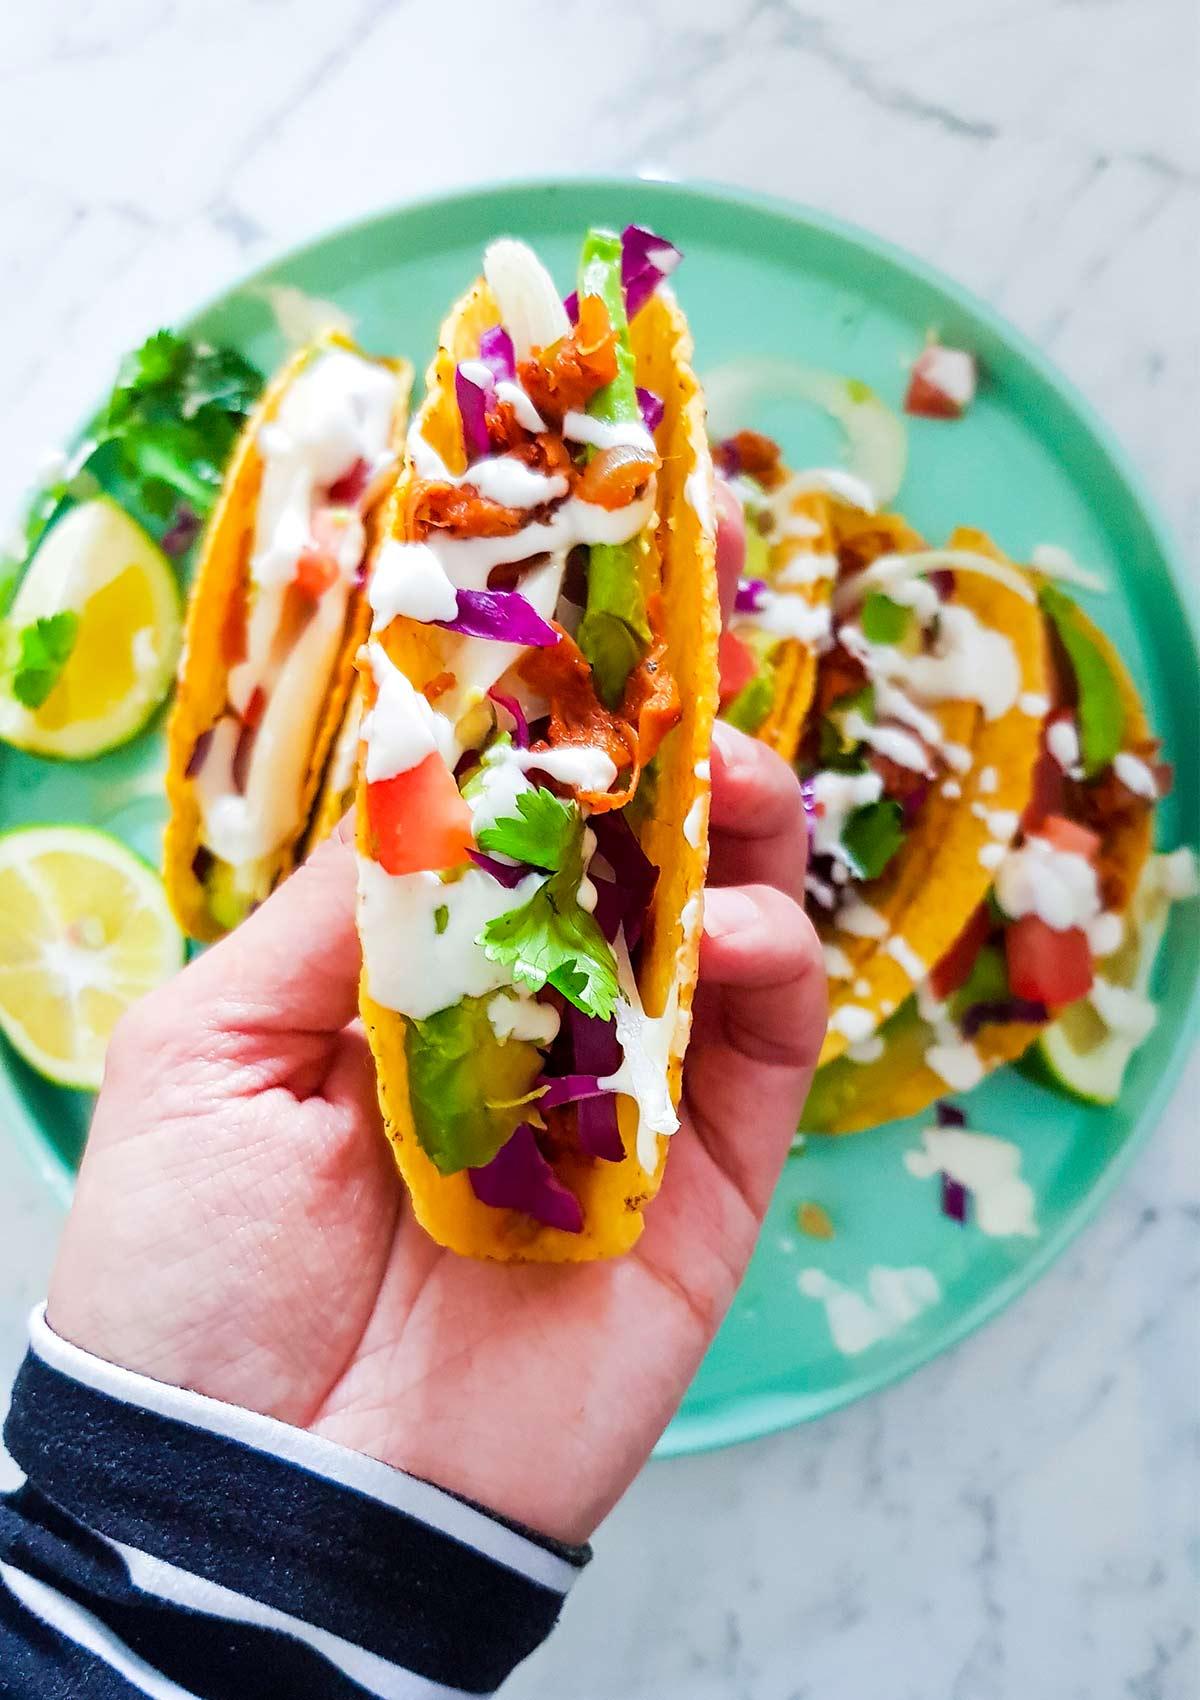 Holding jackfruit taco in hand